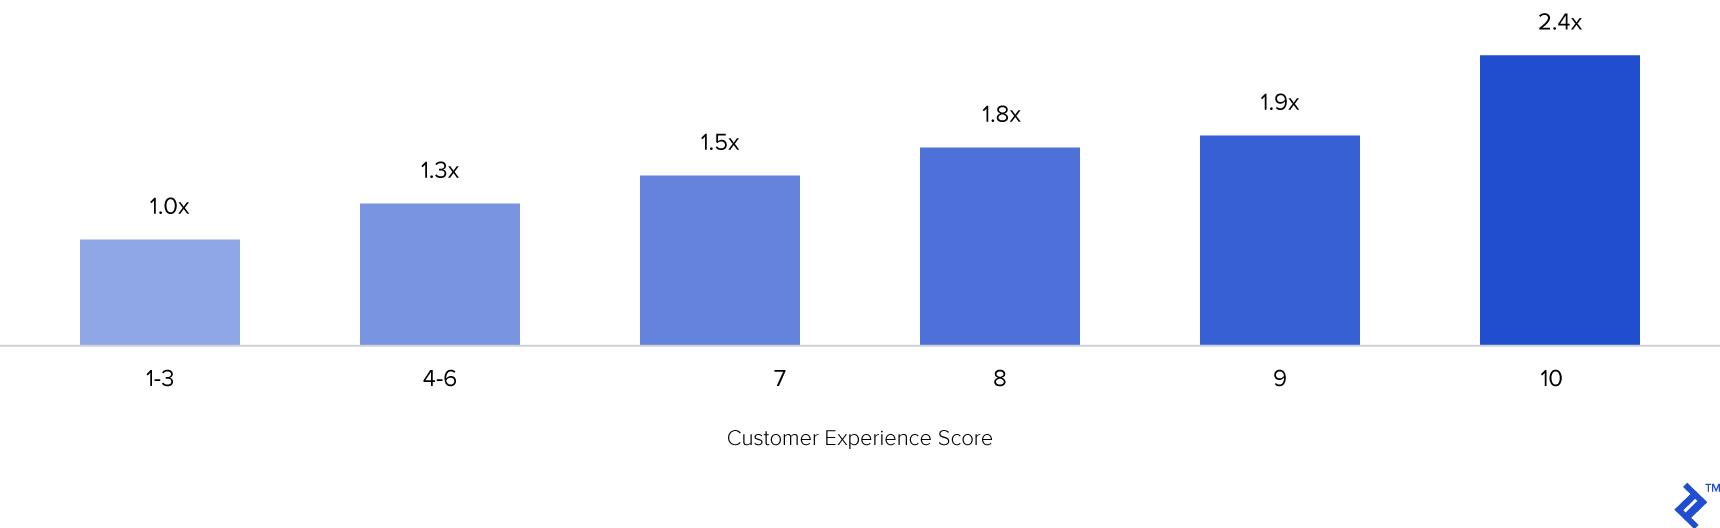 Chart 3: Annual Revenue Increase per customer based on Customer Experience